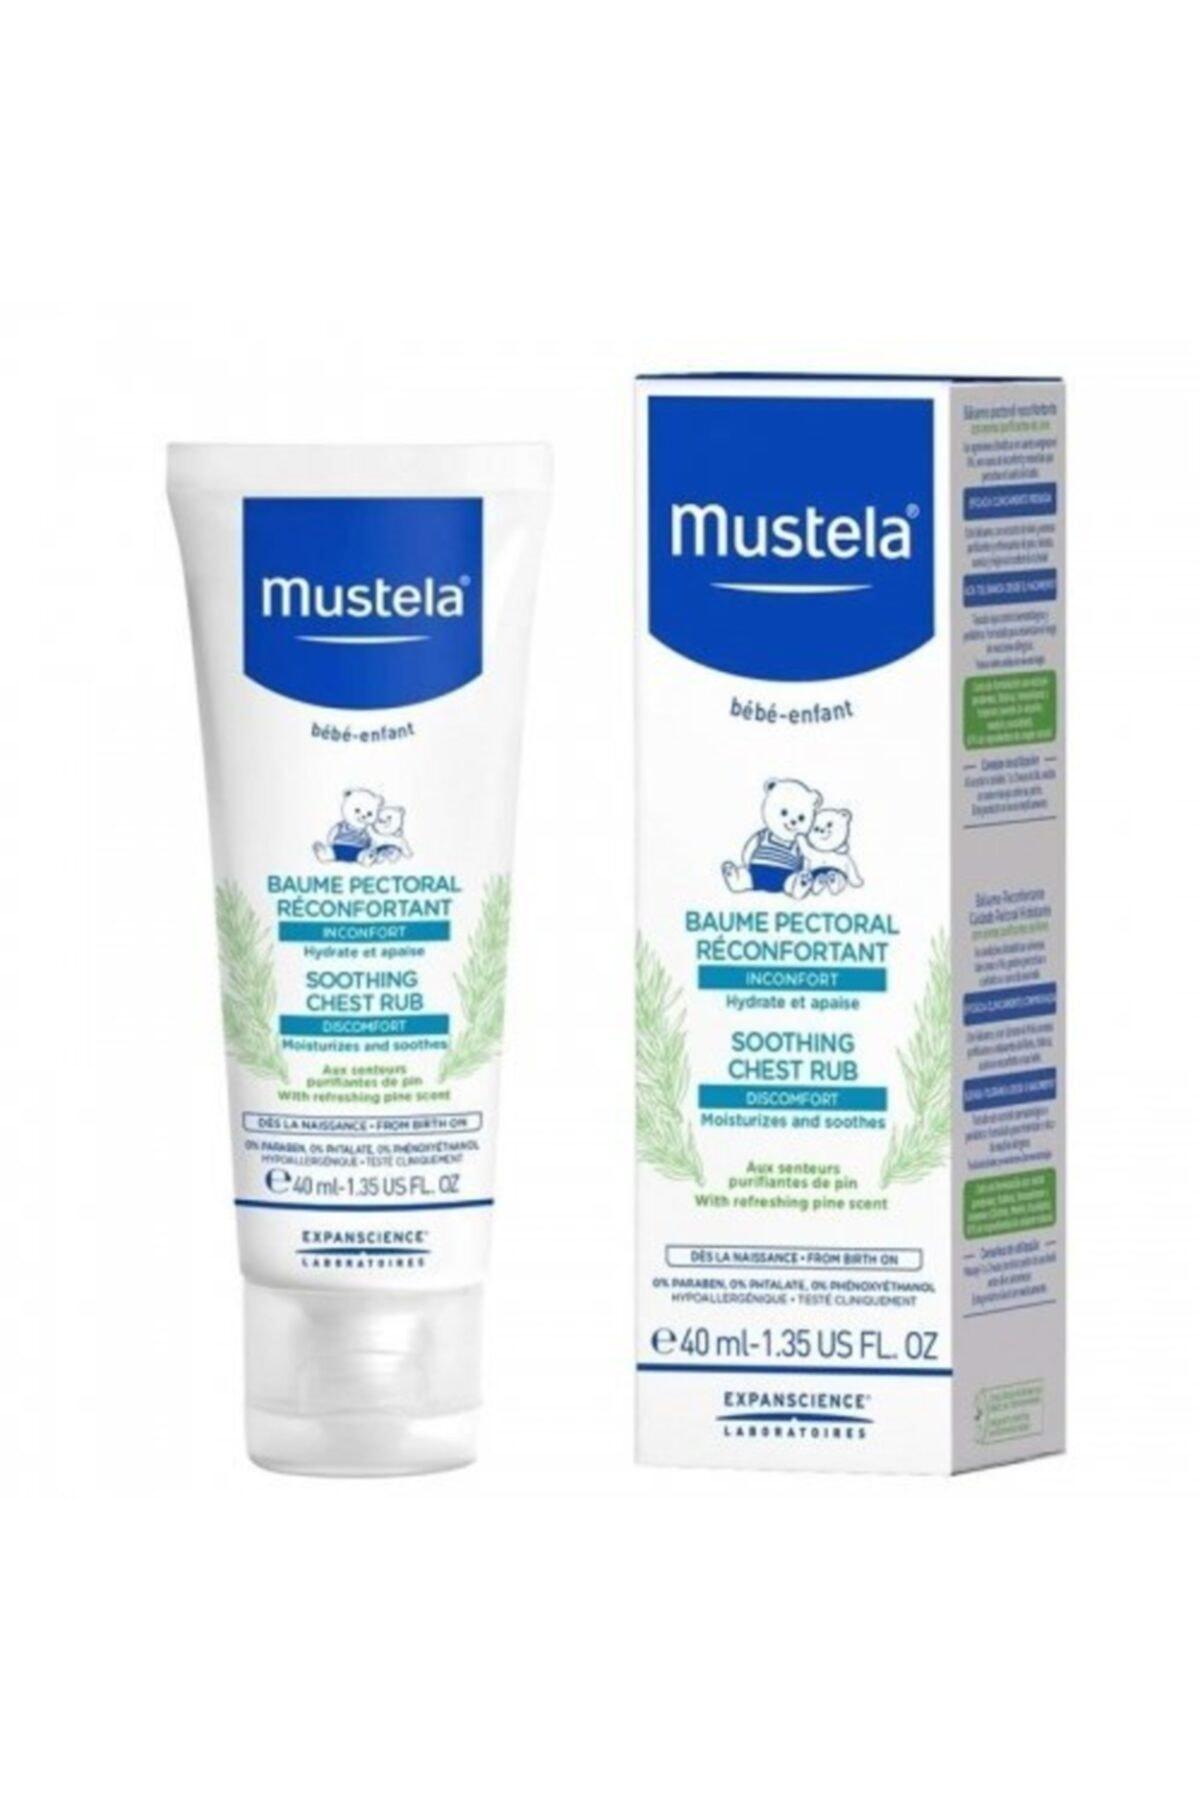 Mustela Soothing Chest Rub 40ml | Yatıştırıcı Göğüs Balsamı 1